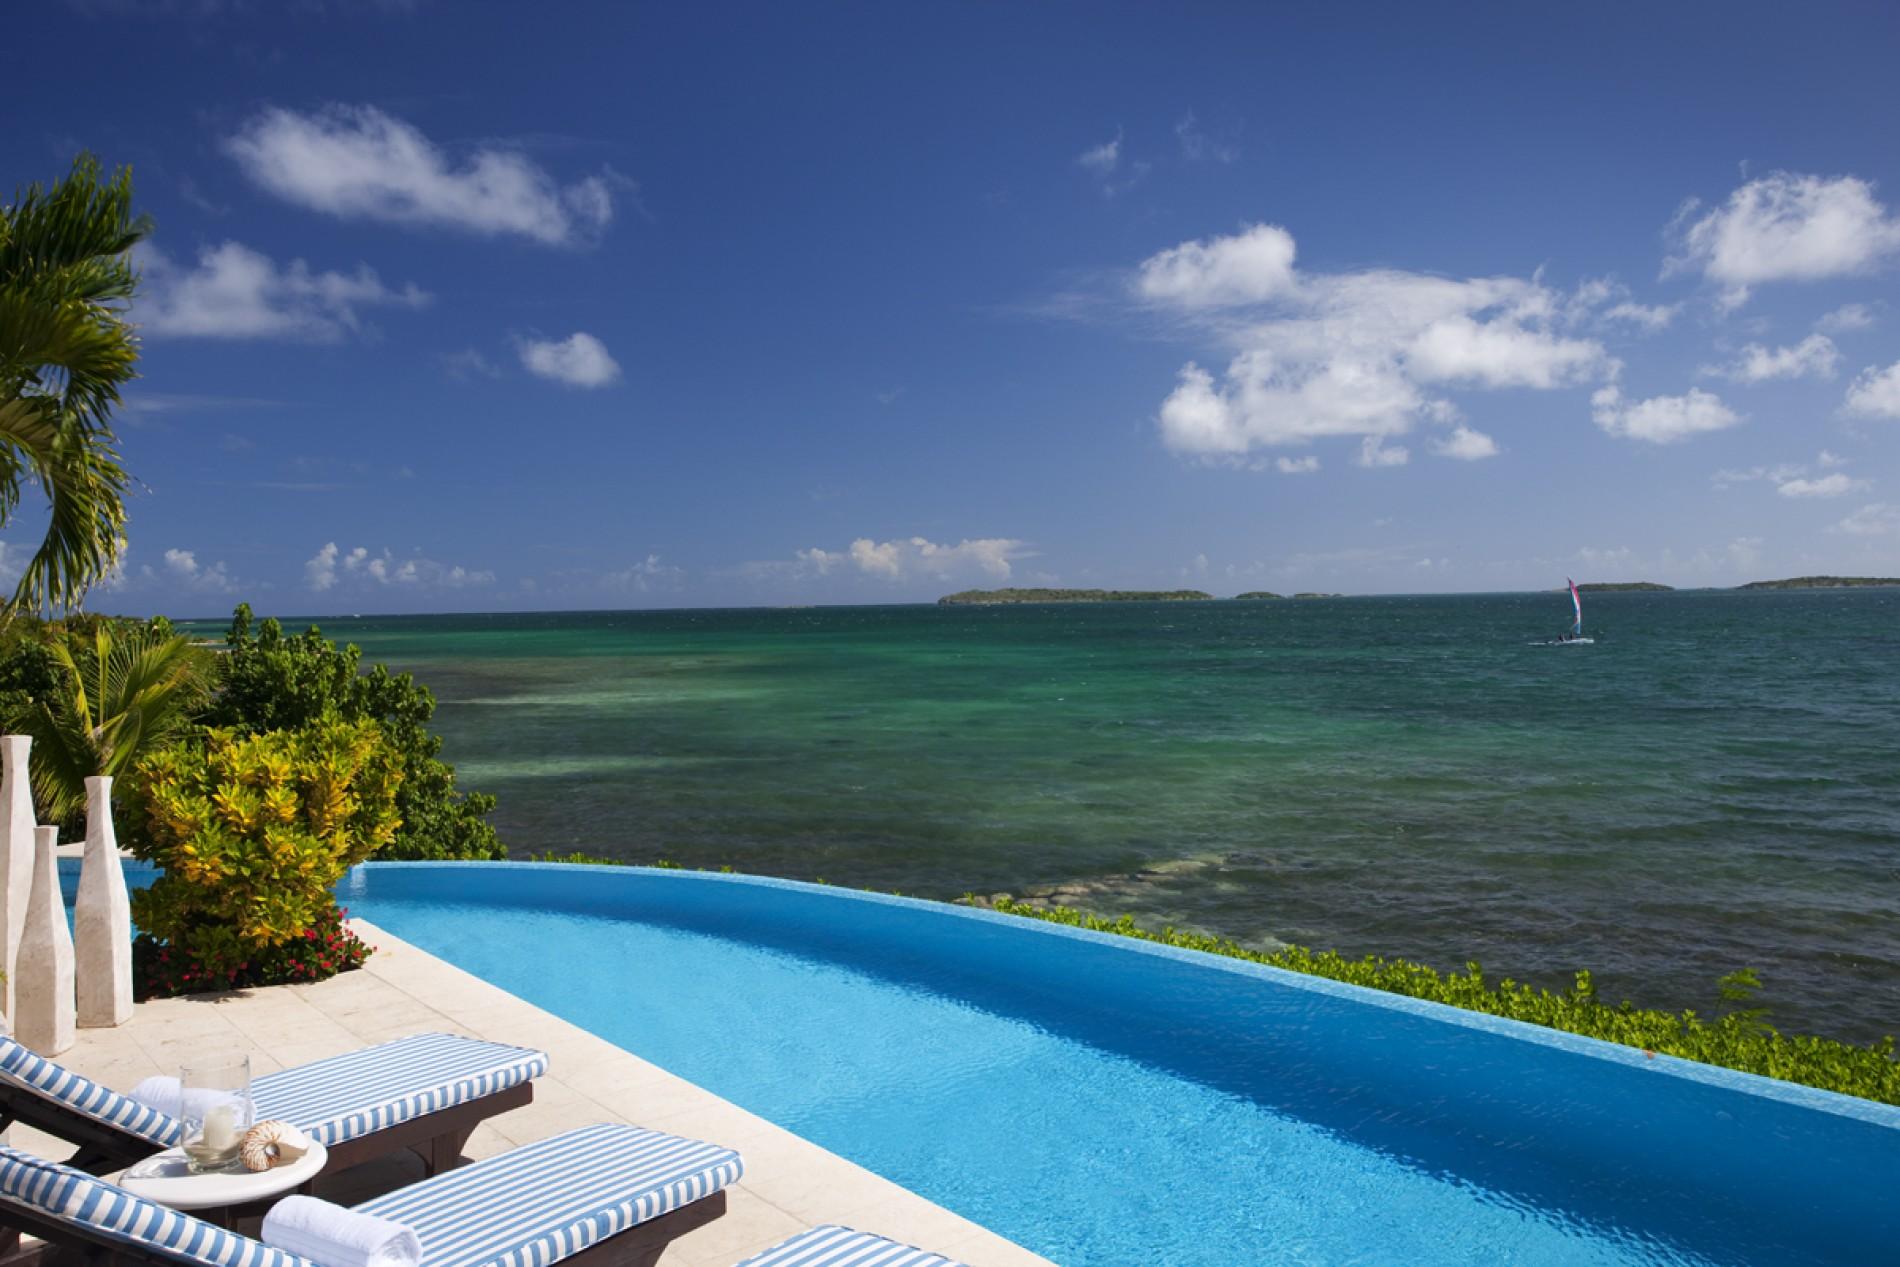 Private Island Rental For Honeymoon